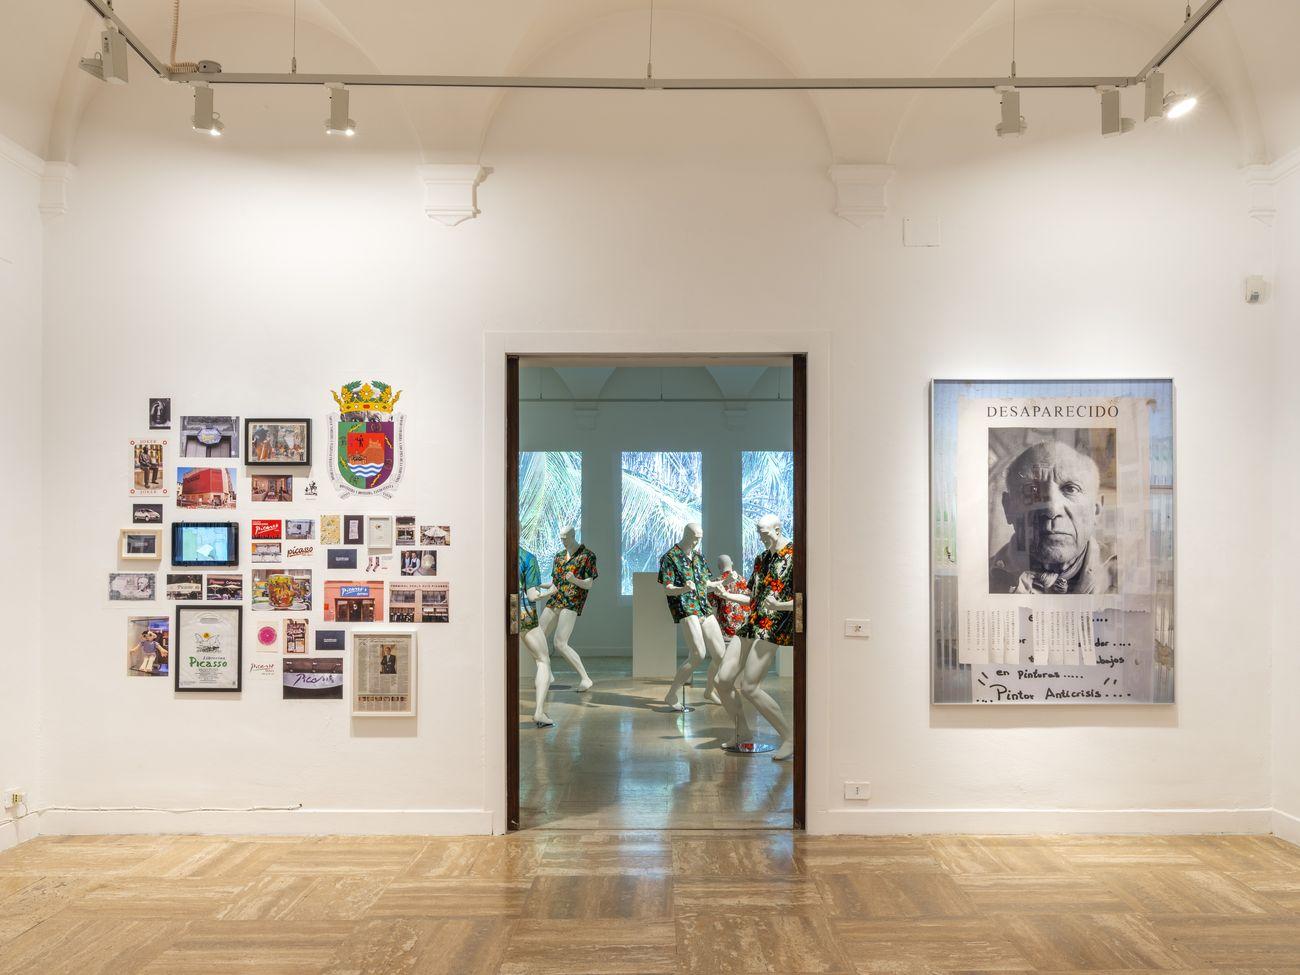 Rogelio López Cuenca, Marca Picasso, 2010 20, installazione multimedia. Installation view at Real Academia de España, Roma 2021. Collezione dell'artista. Photo Juan Baraja